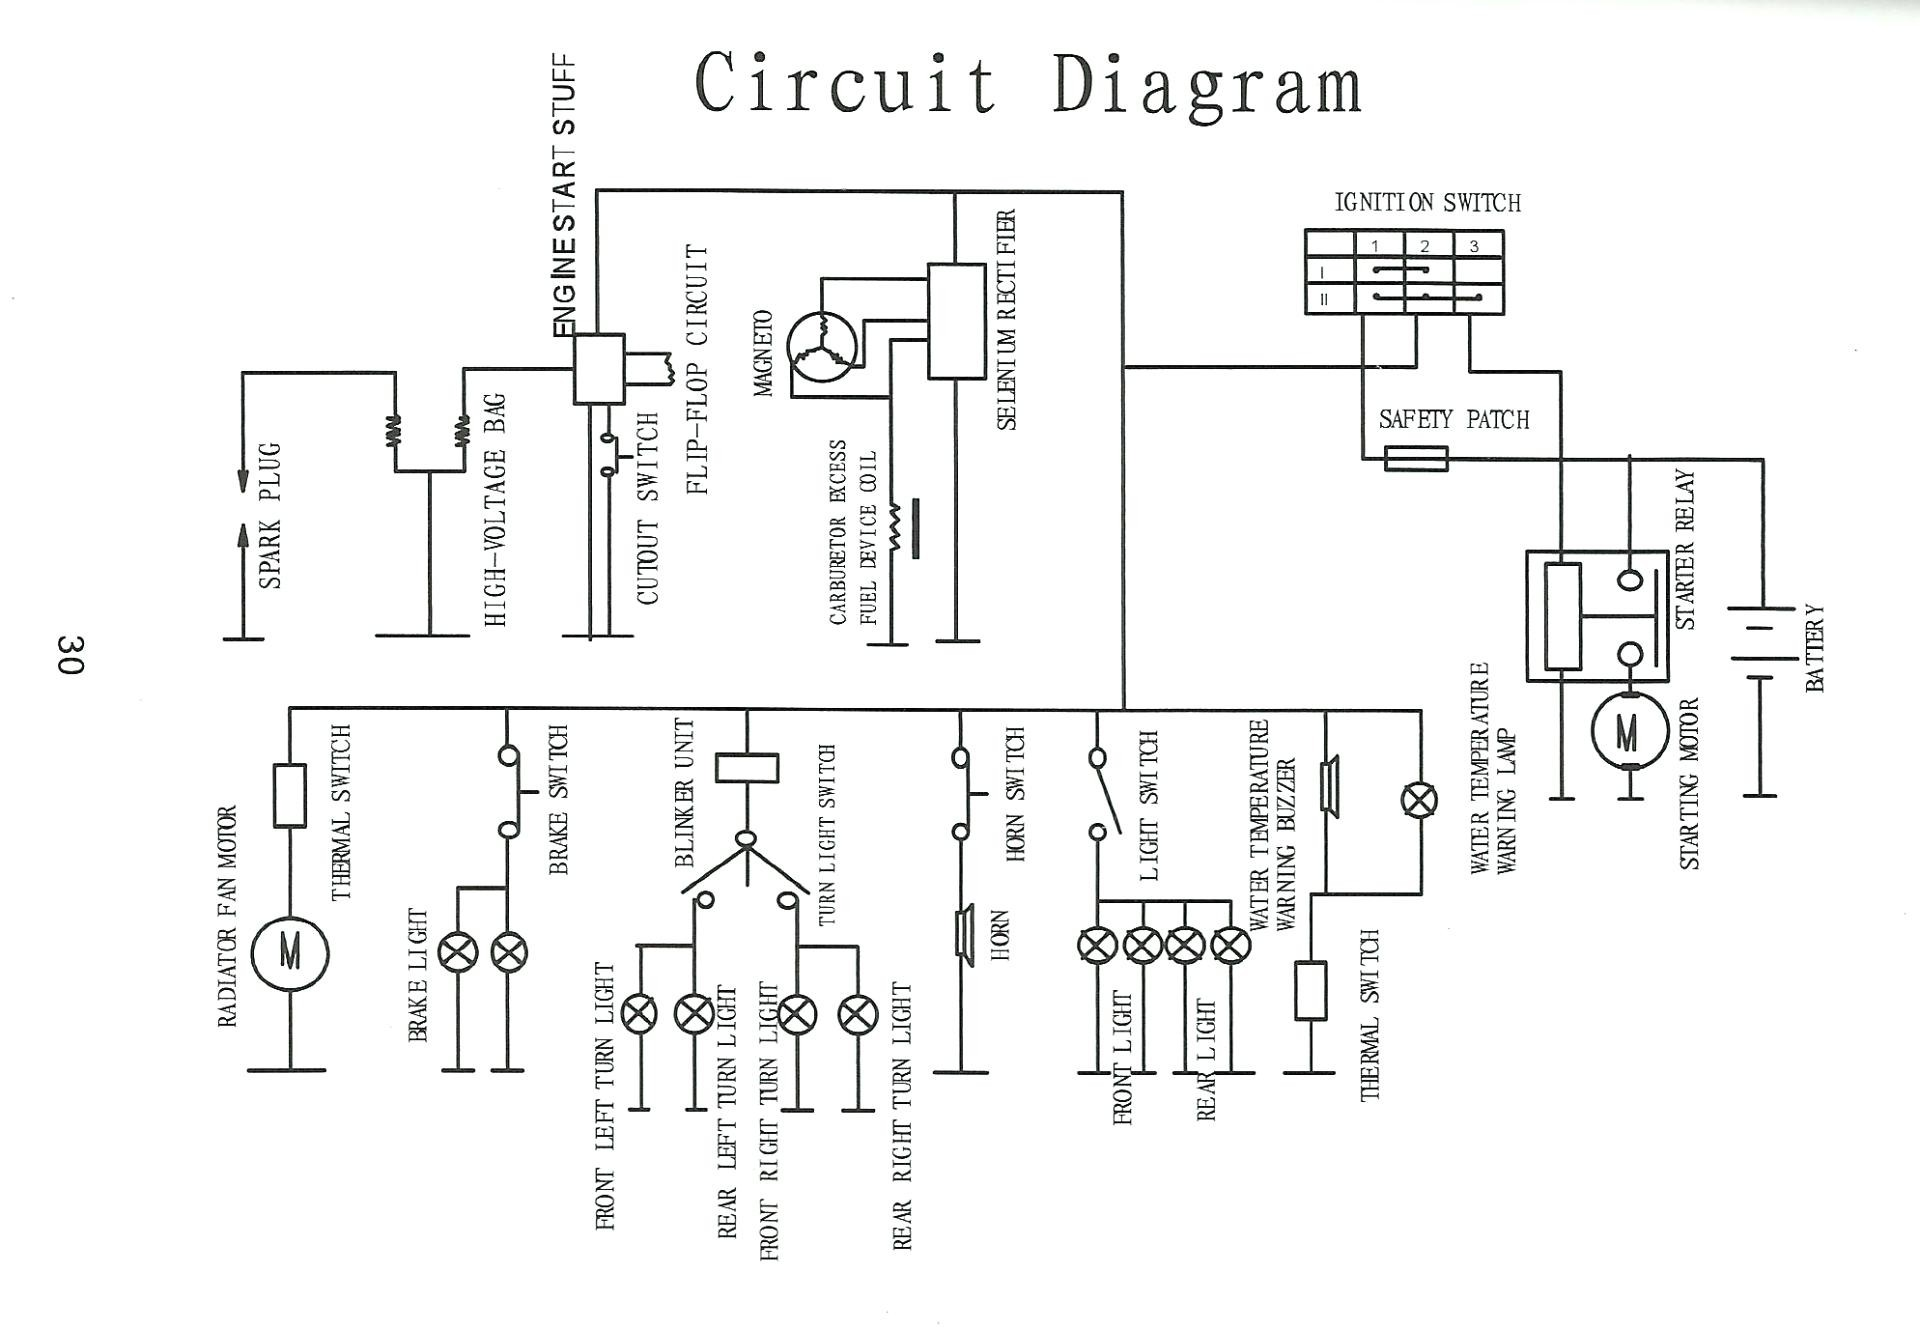 [QNCB_7524]  Roketa 250 Go Kart Wiring Diagram | Wiring Diagram | 250cc Gy6 Wiring Diagram |  | Wiring Diagram - AutoScout24